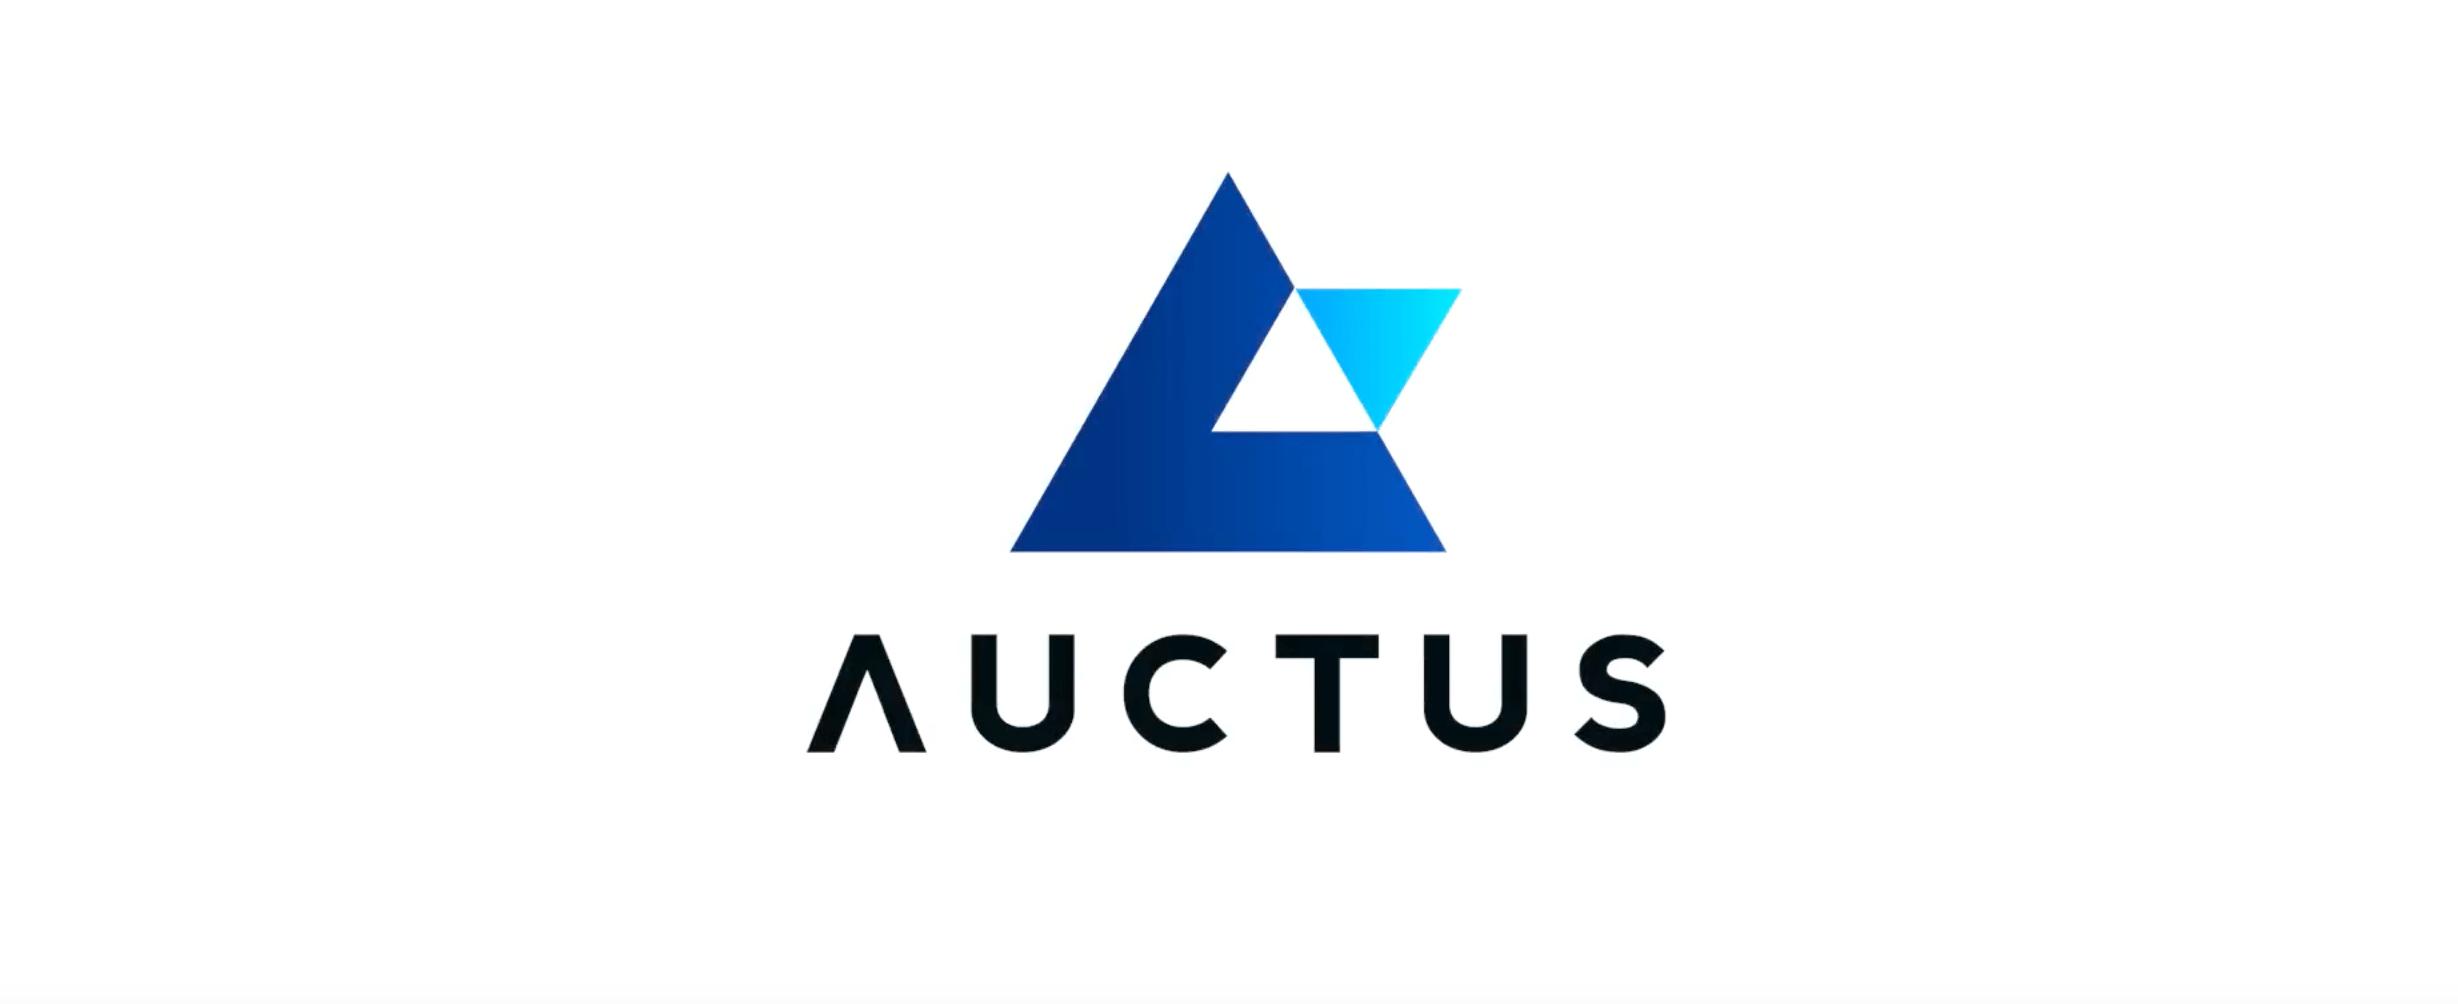 Retirement Planning Platform Auctus Partners With